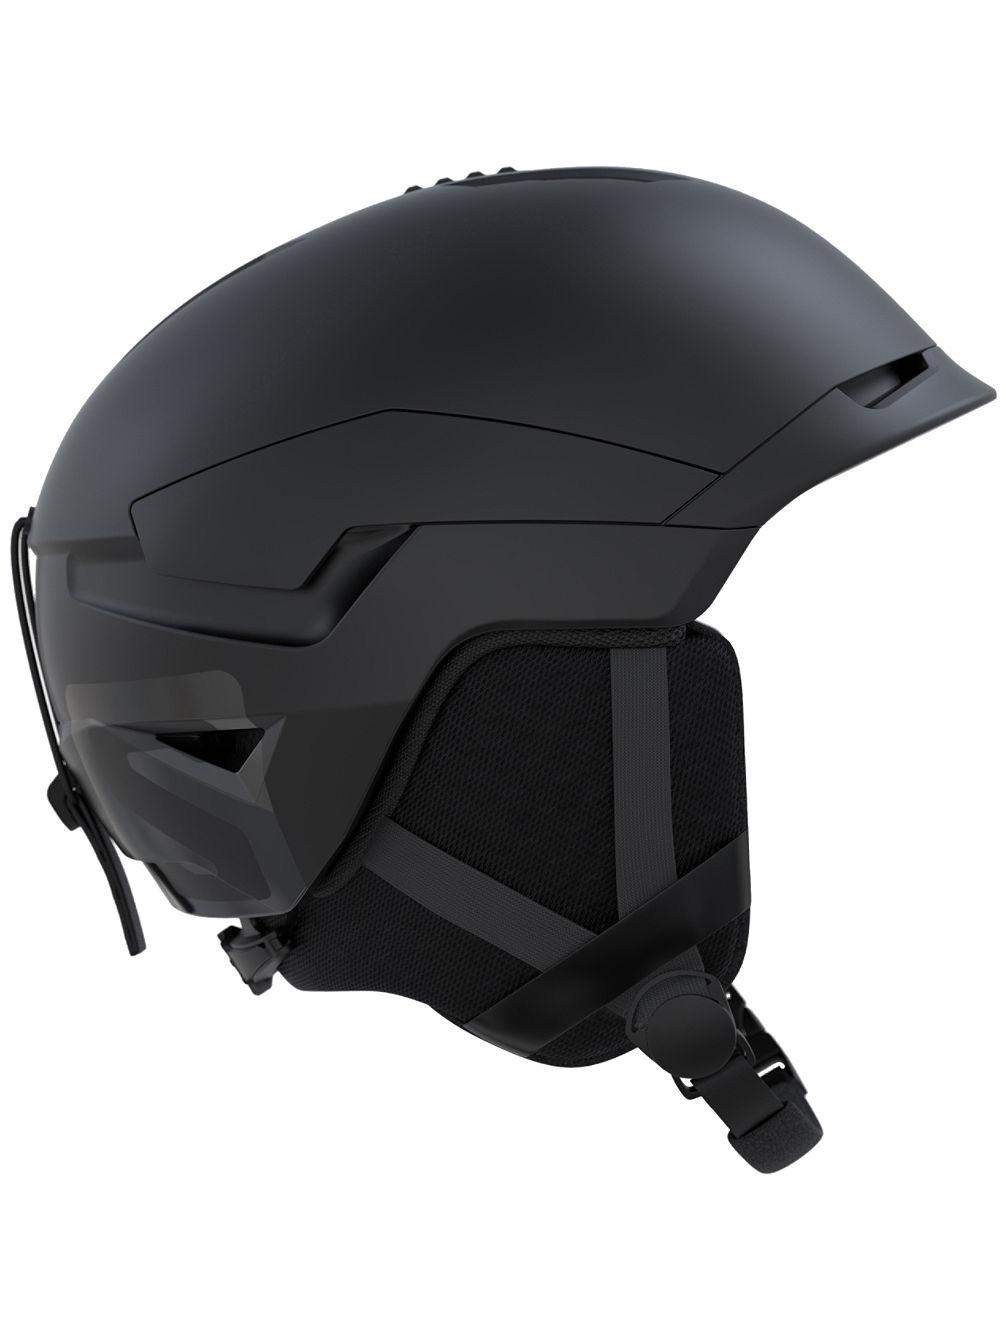 Quest Access Helmet